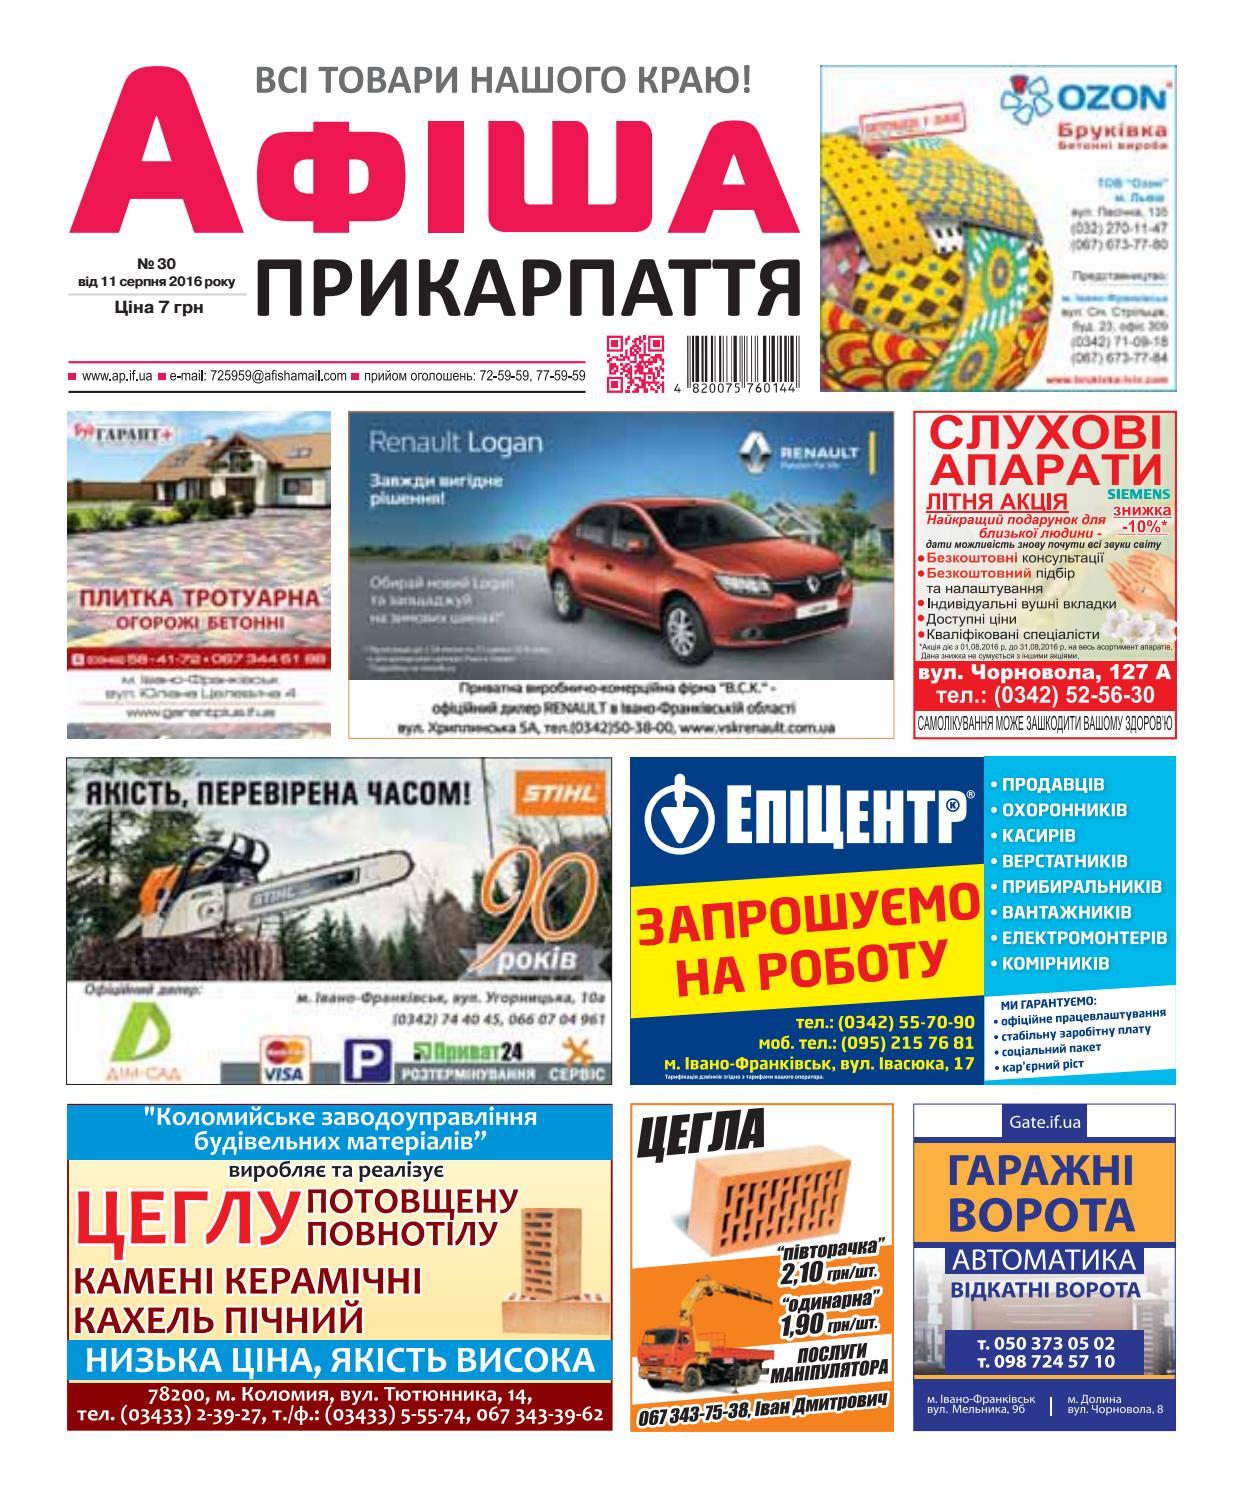 Афіша ПРИКАРПАТТЯ №30 by Olya Olya - issuu b426c8b3d99e9